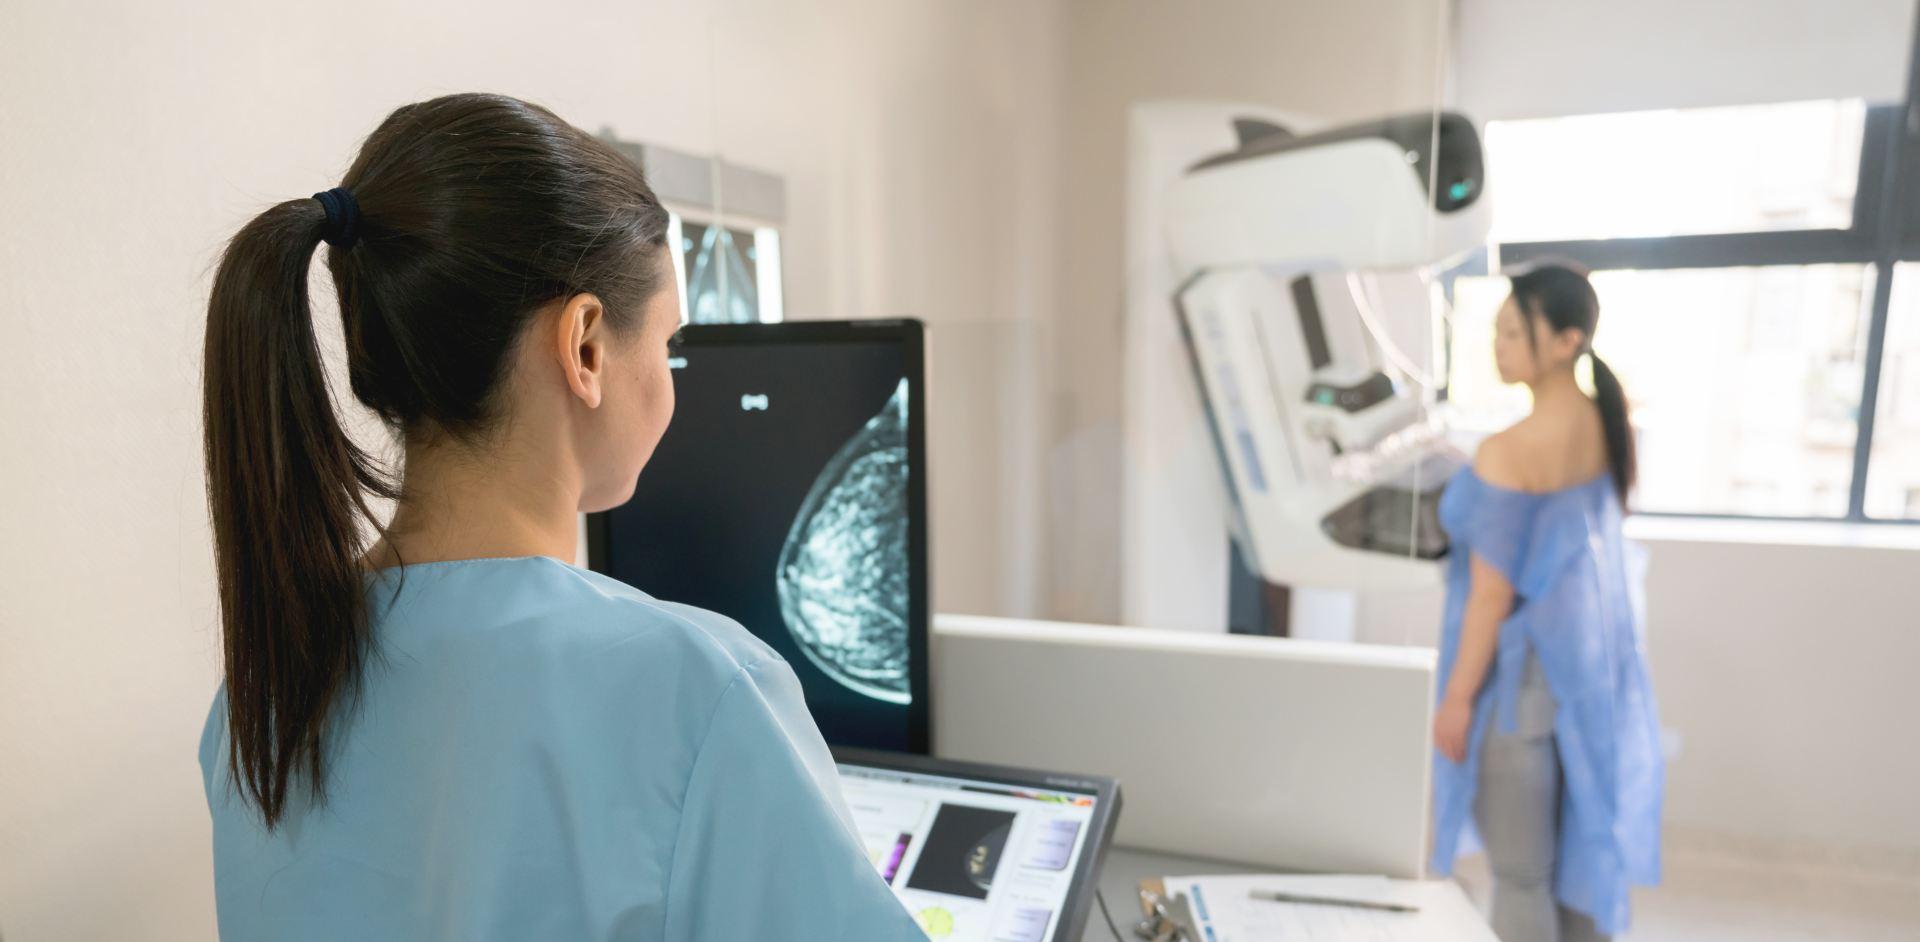 Mammogram in progress